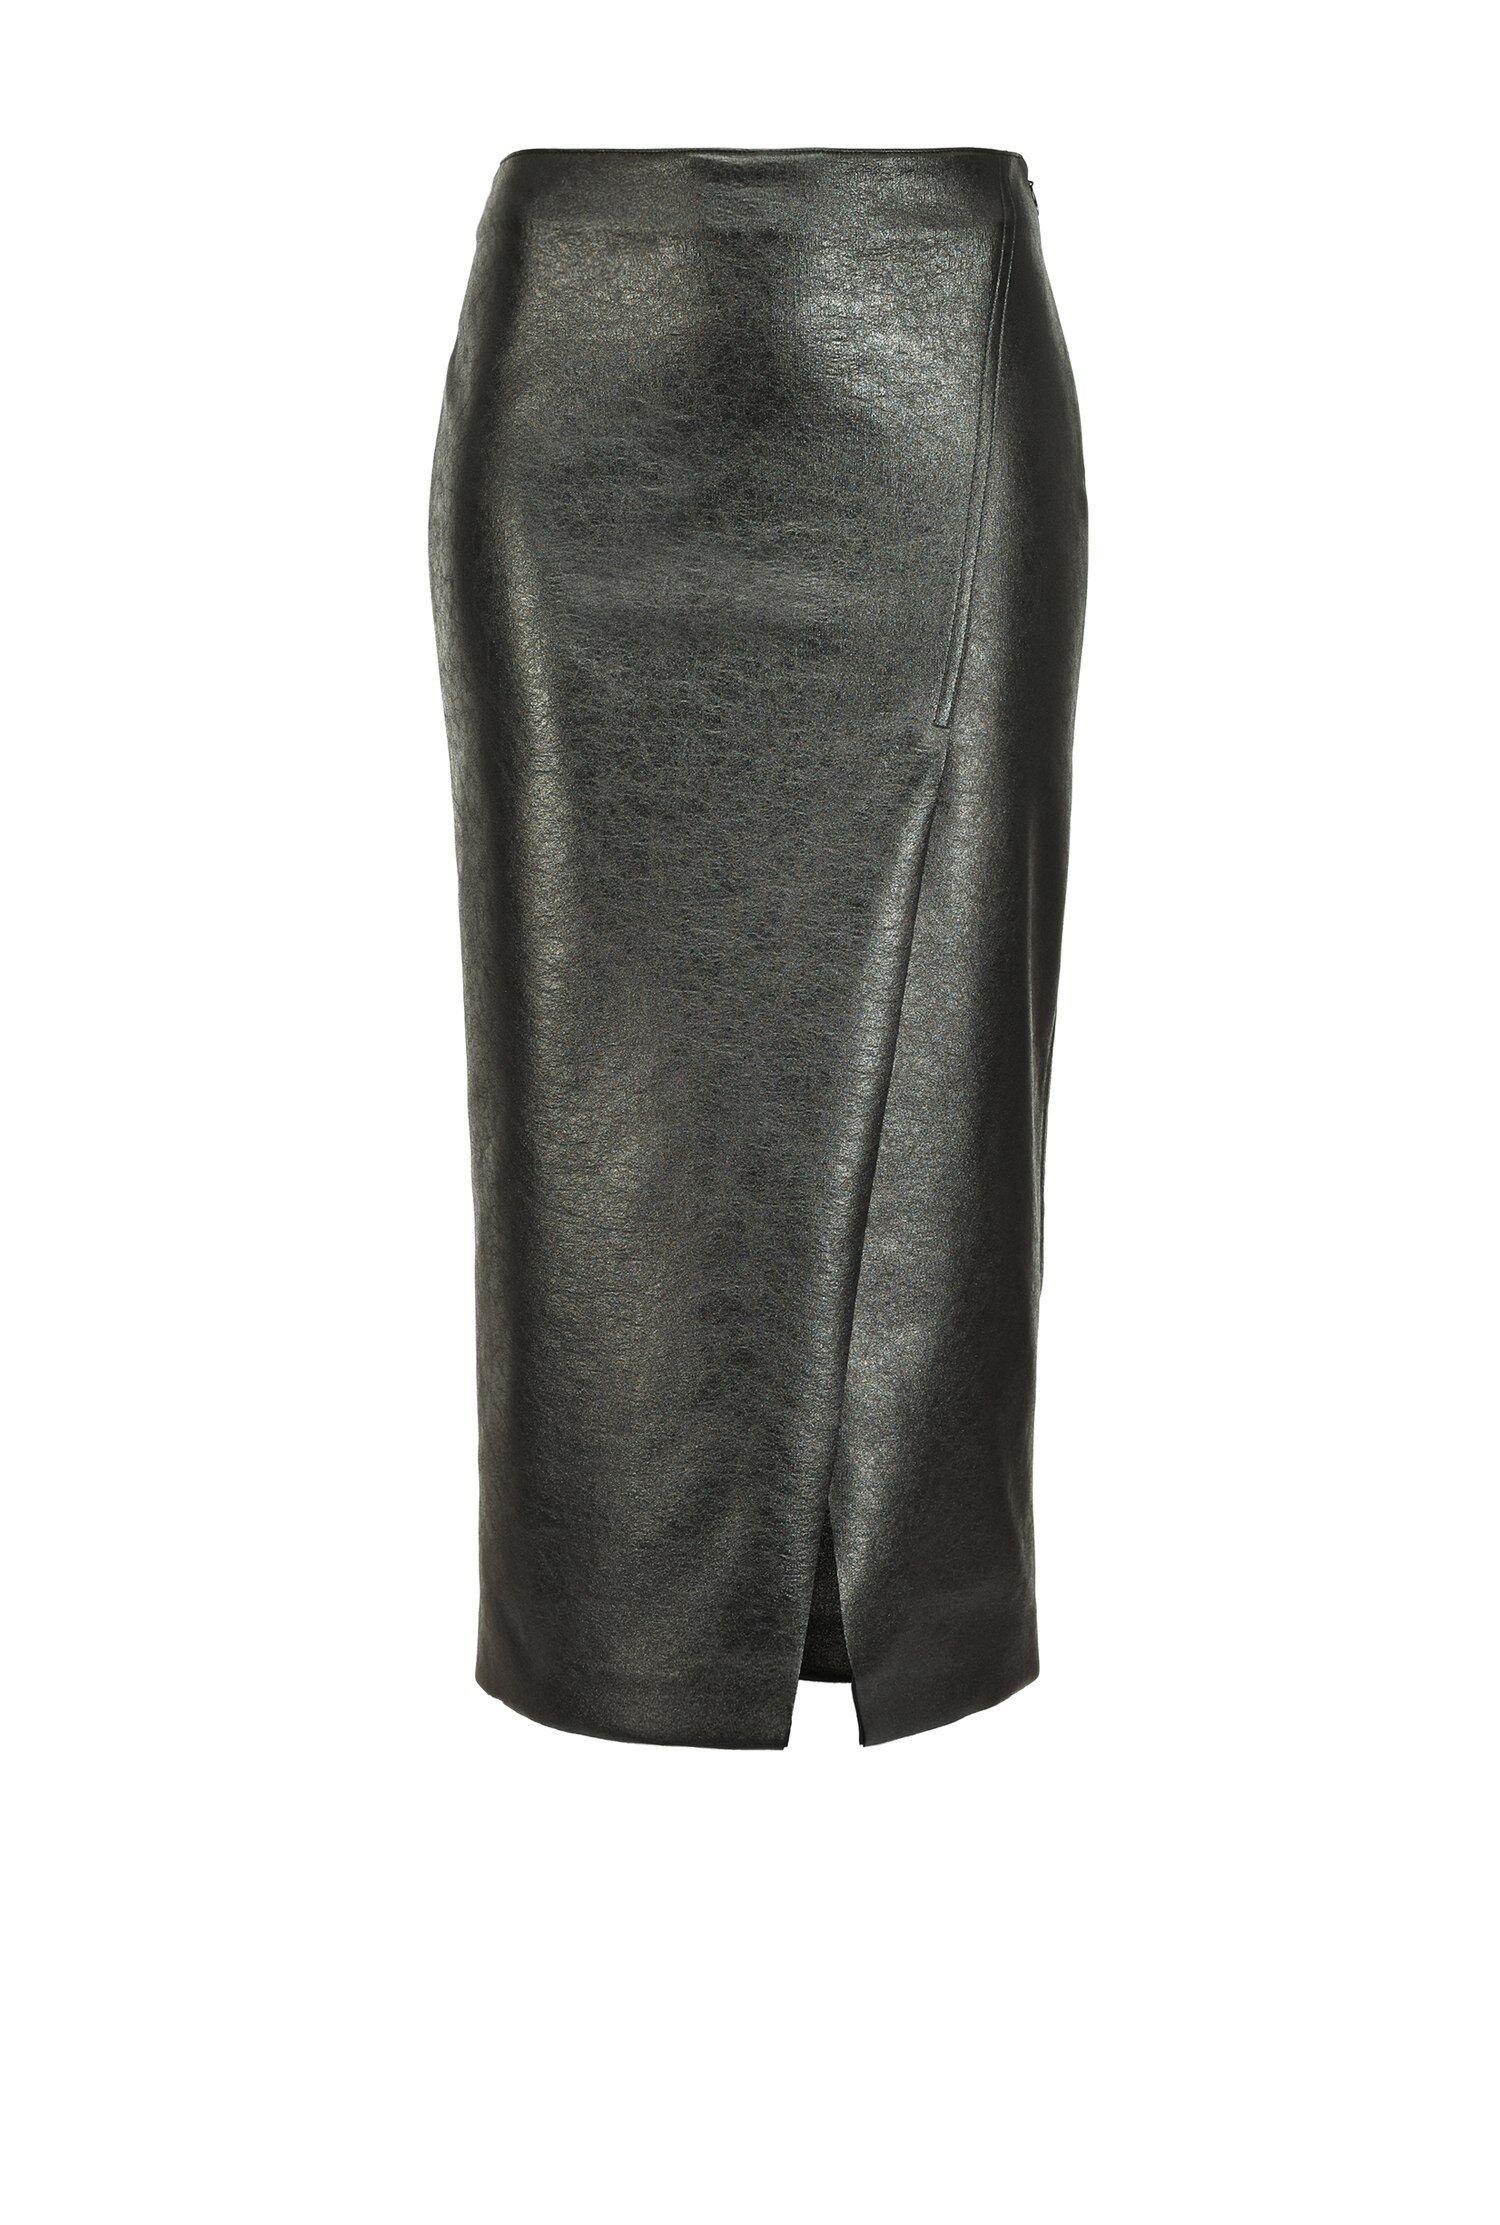 Laminated Scuba Effect Longuette Skirt - Pinko